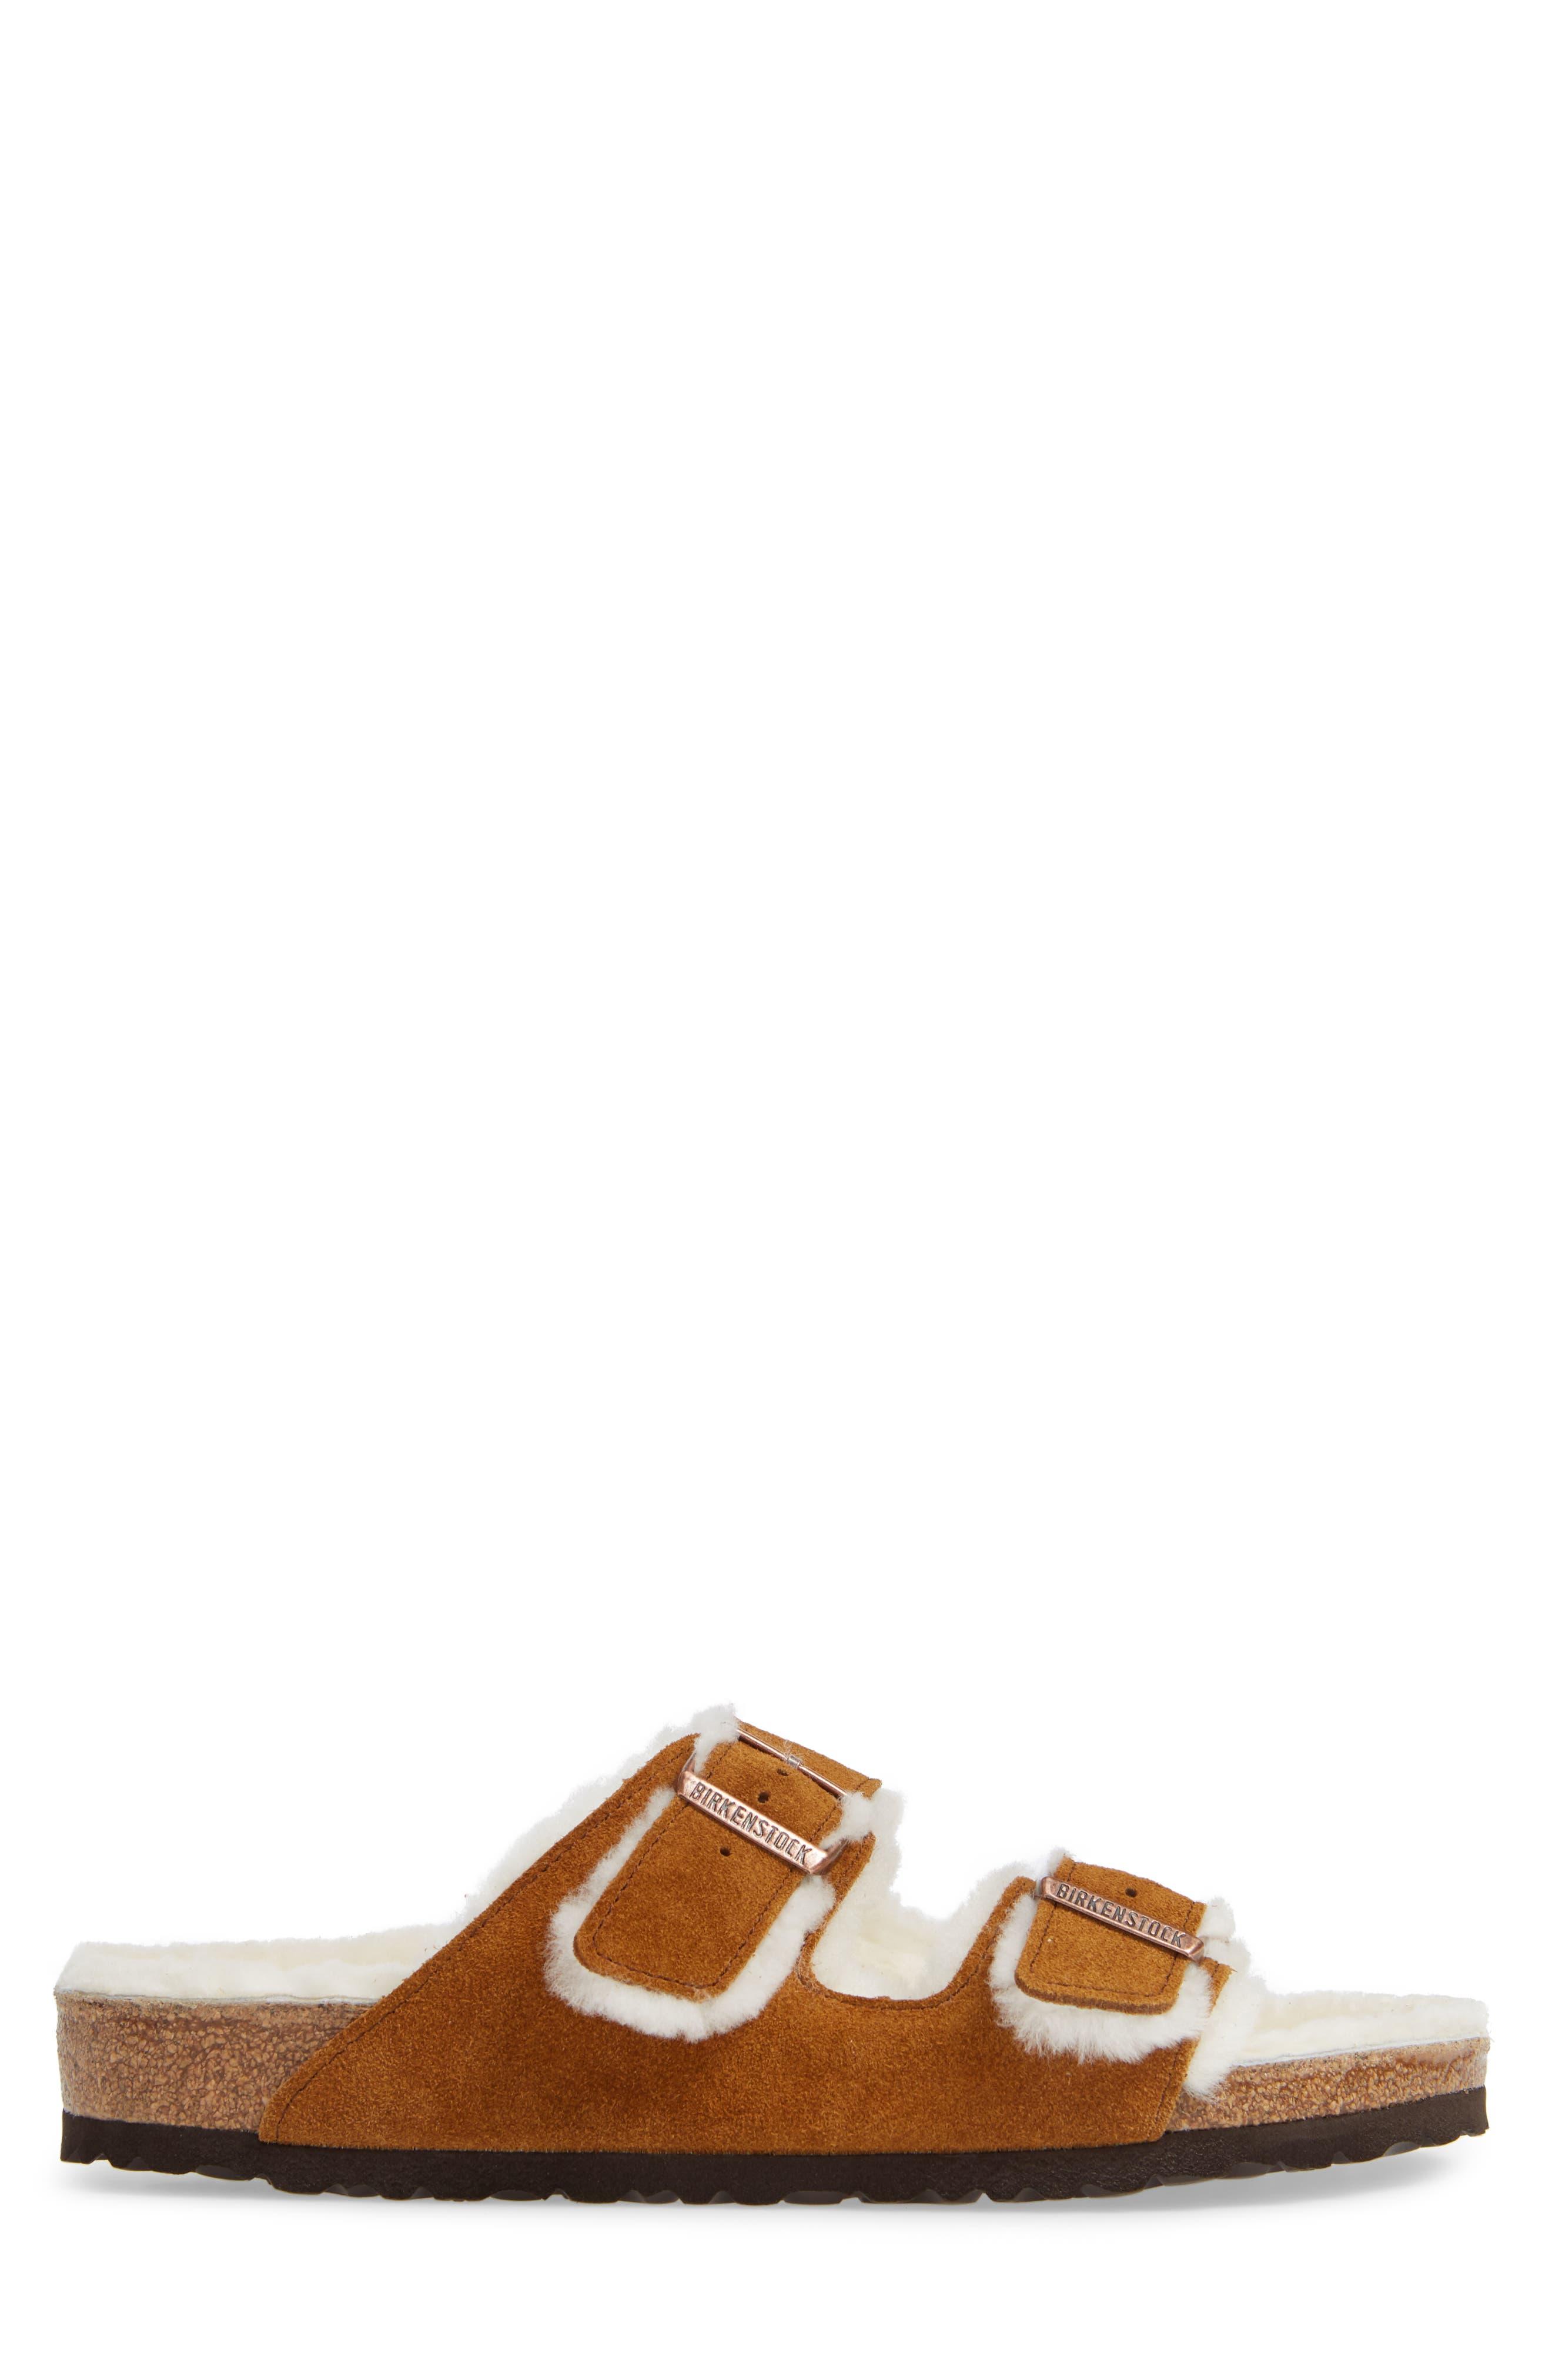 Arizona Slide Sandal with Genuine Shearling,                             Alternate thumbnail 3, color,                             BEIGE